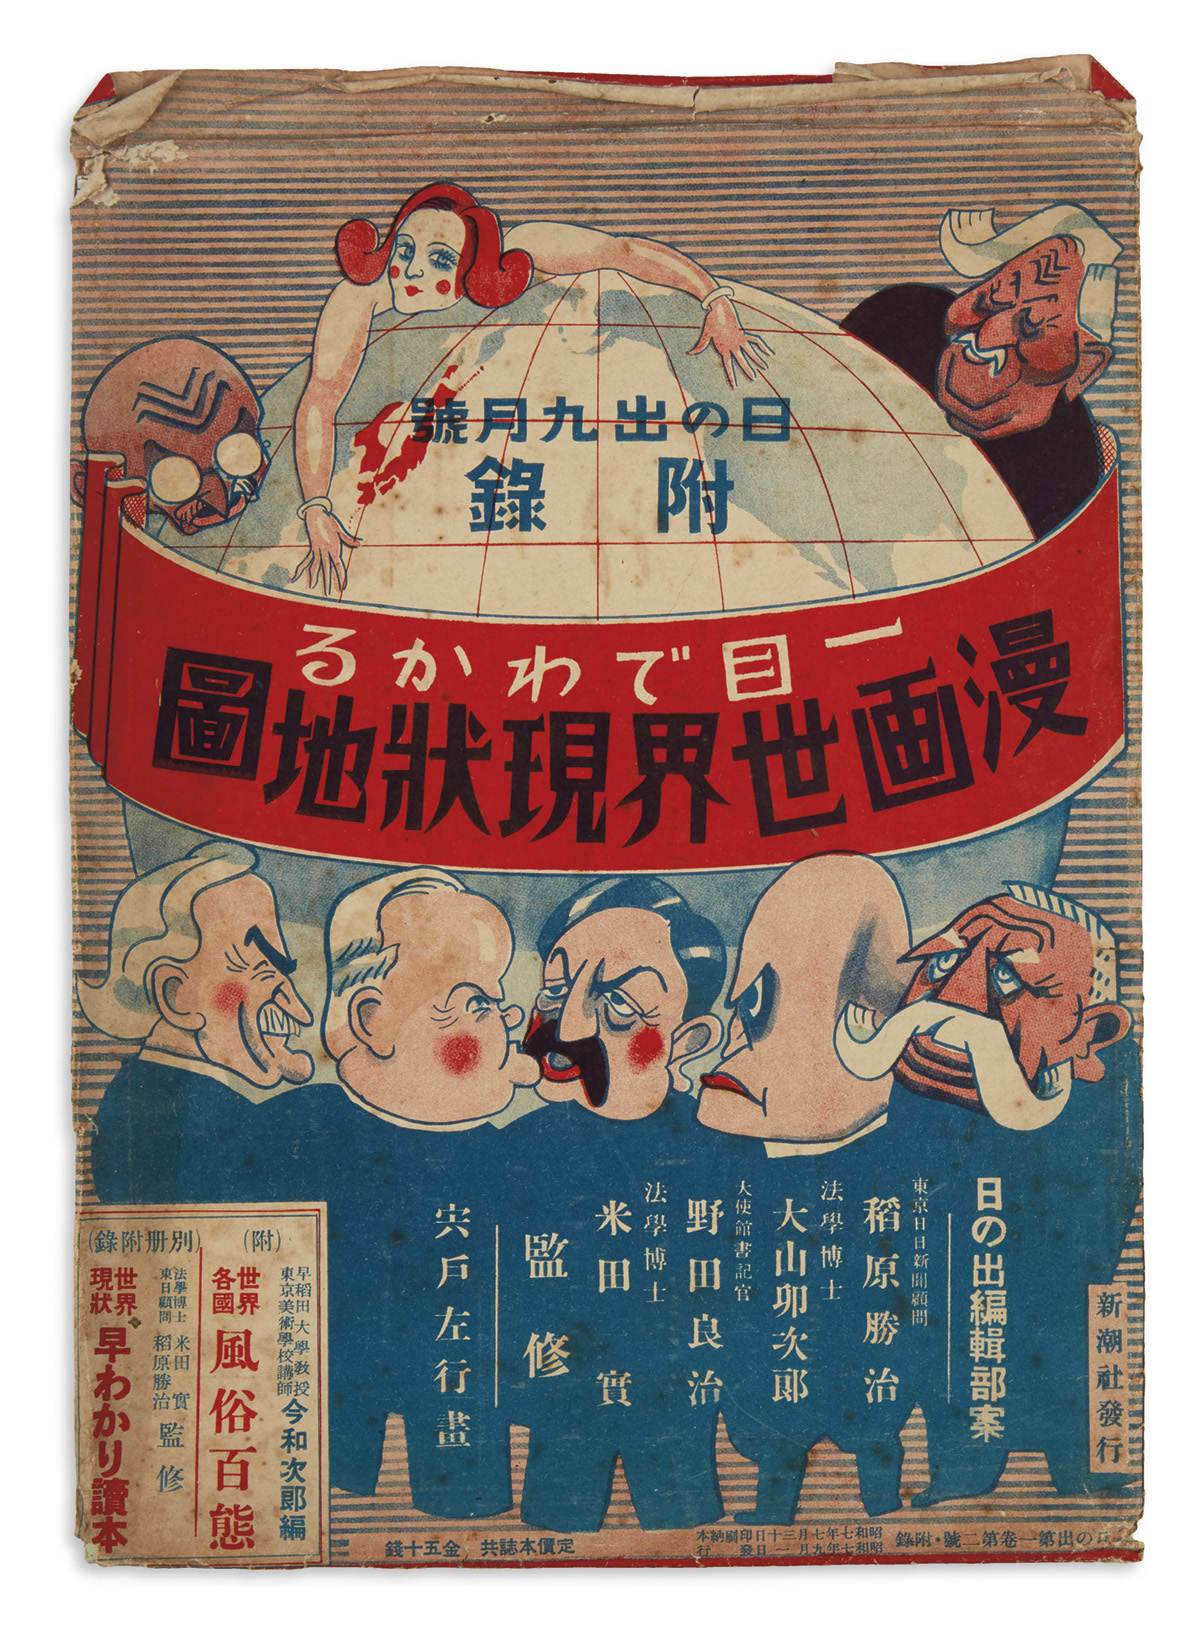 (CARICATURE MAP.) Sagyo Shishido. Hitome de Wakaru Manga Sekai Genjo Chizu. [Cartoon Map of the Current World Situation].